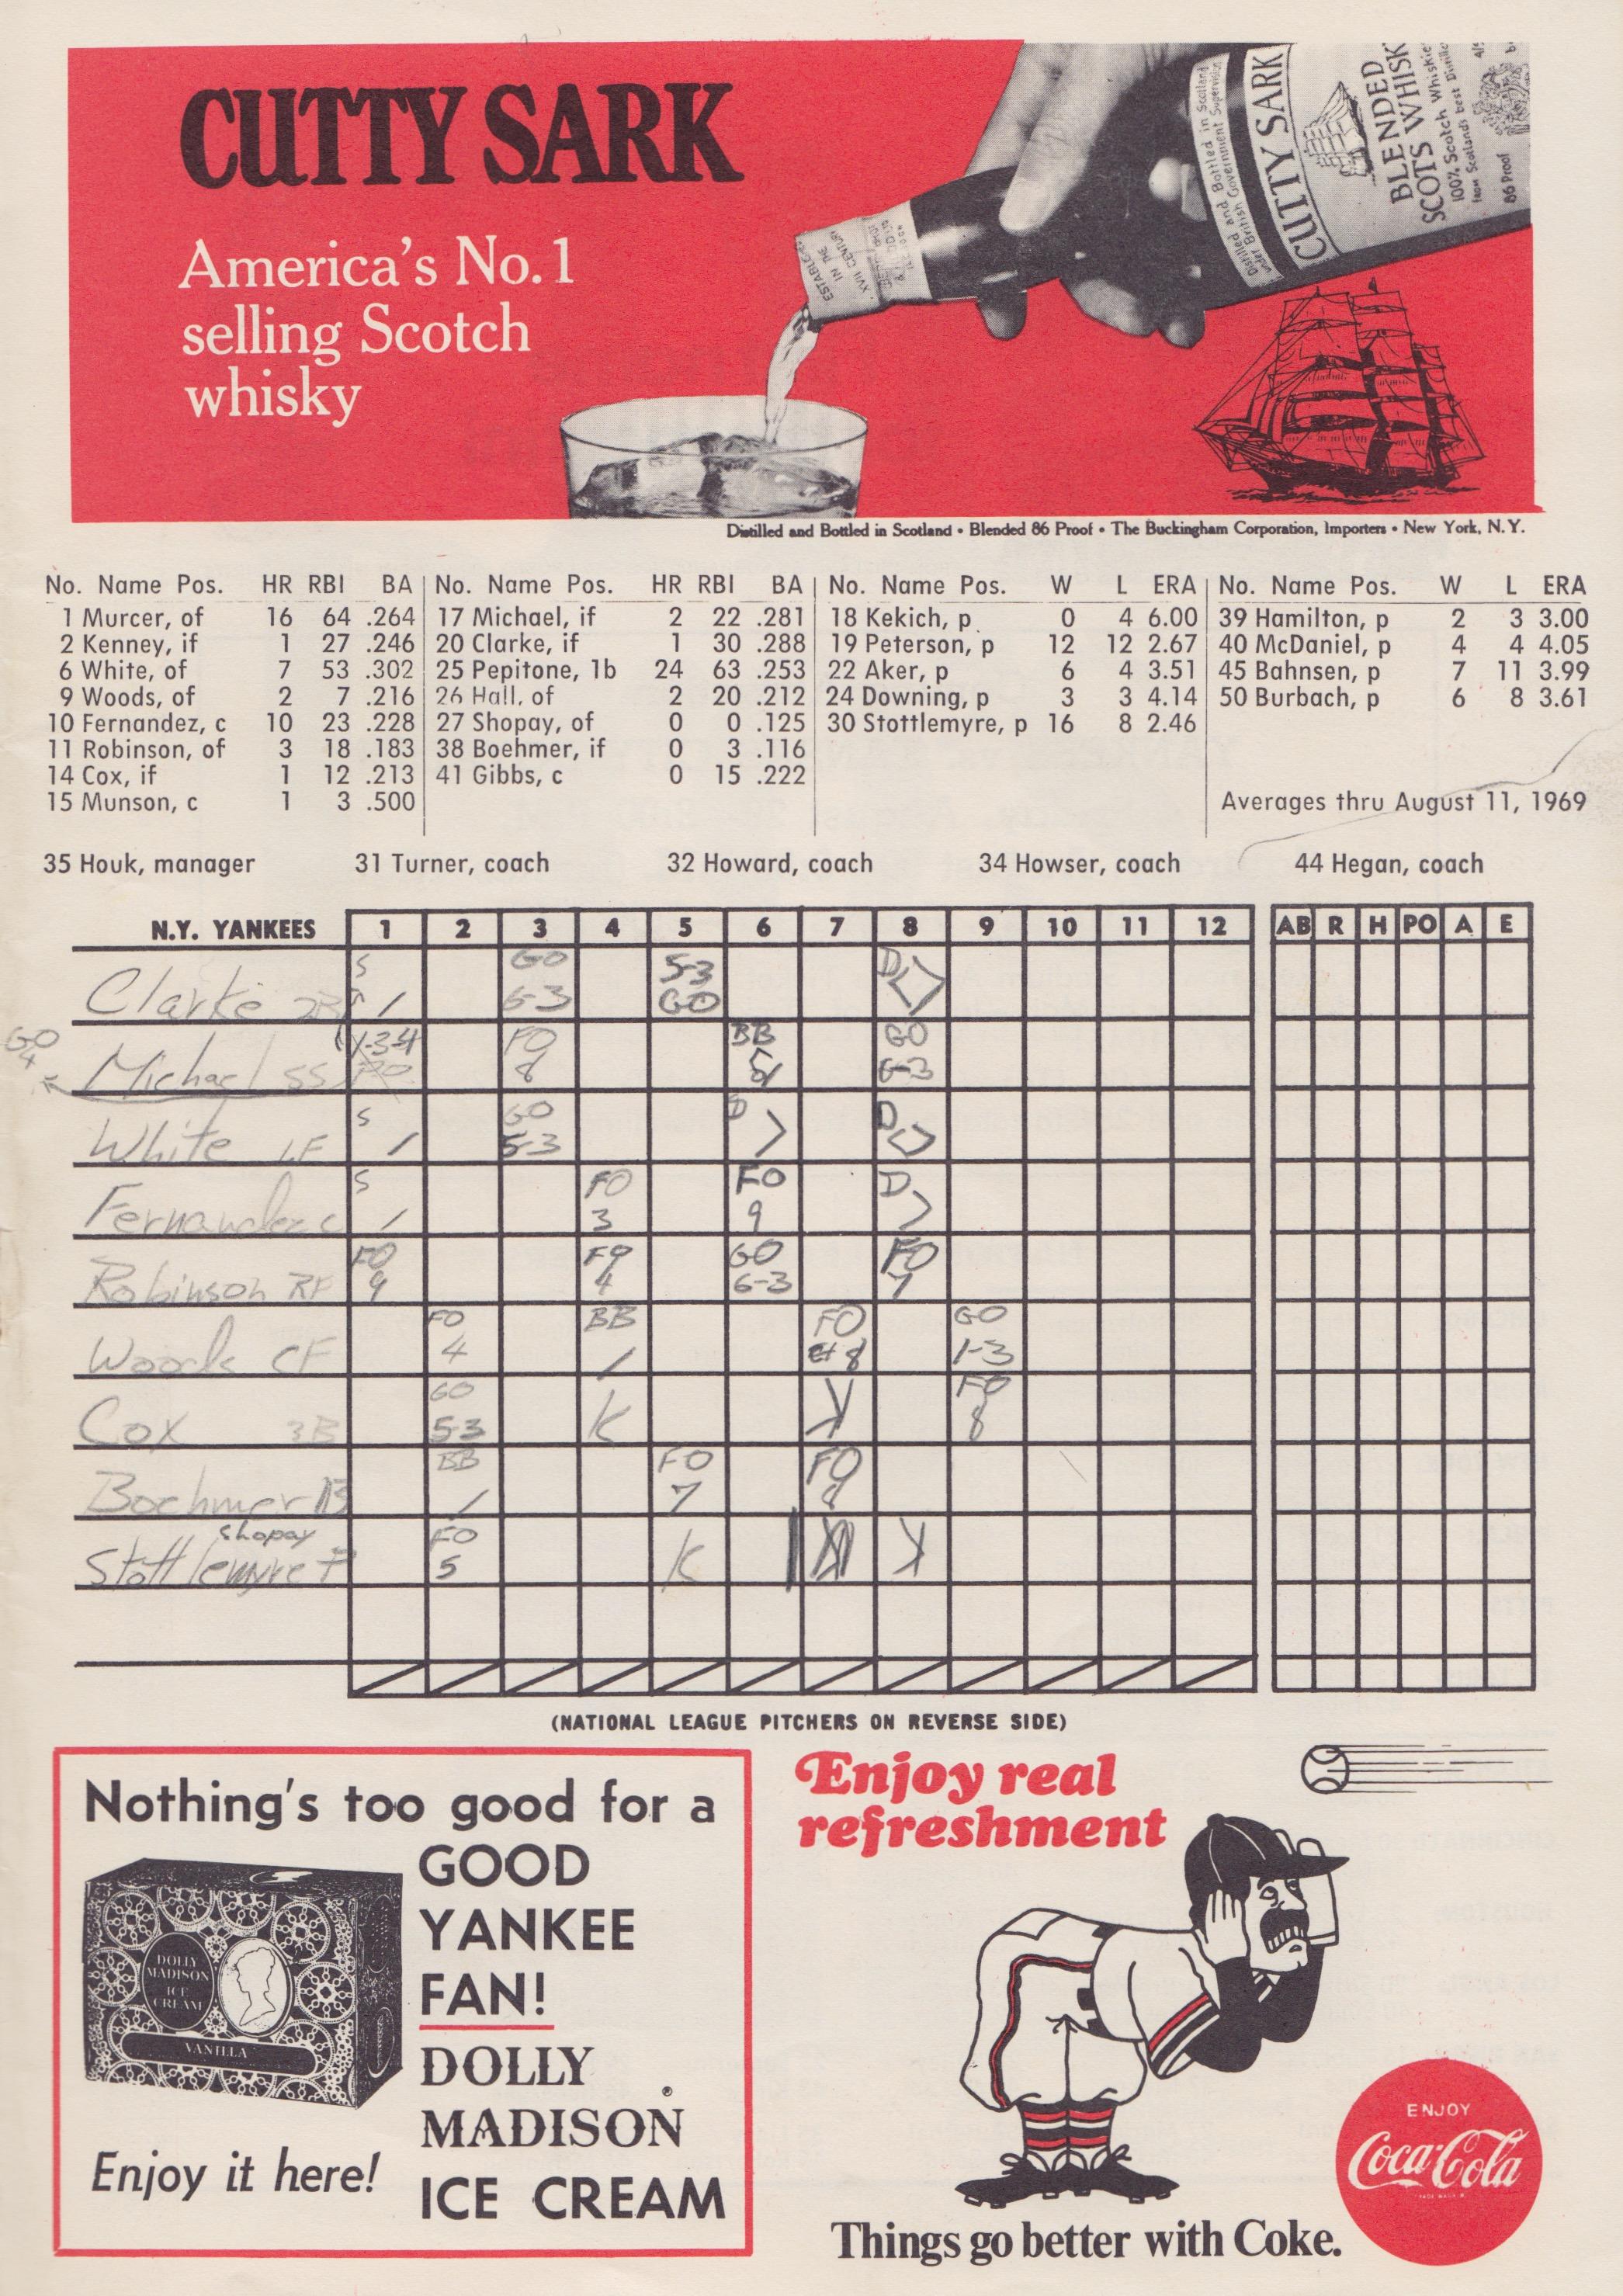 Twins vs. Yankees August 13, 1969